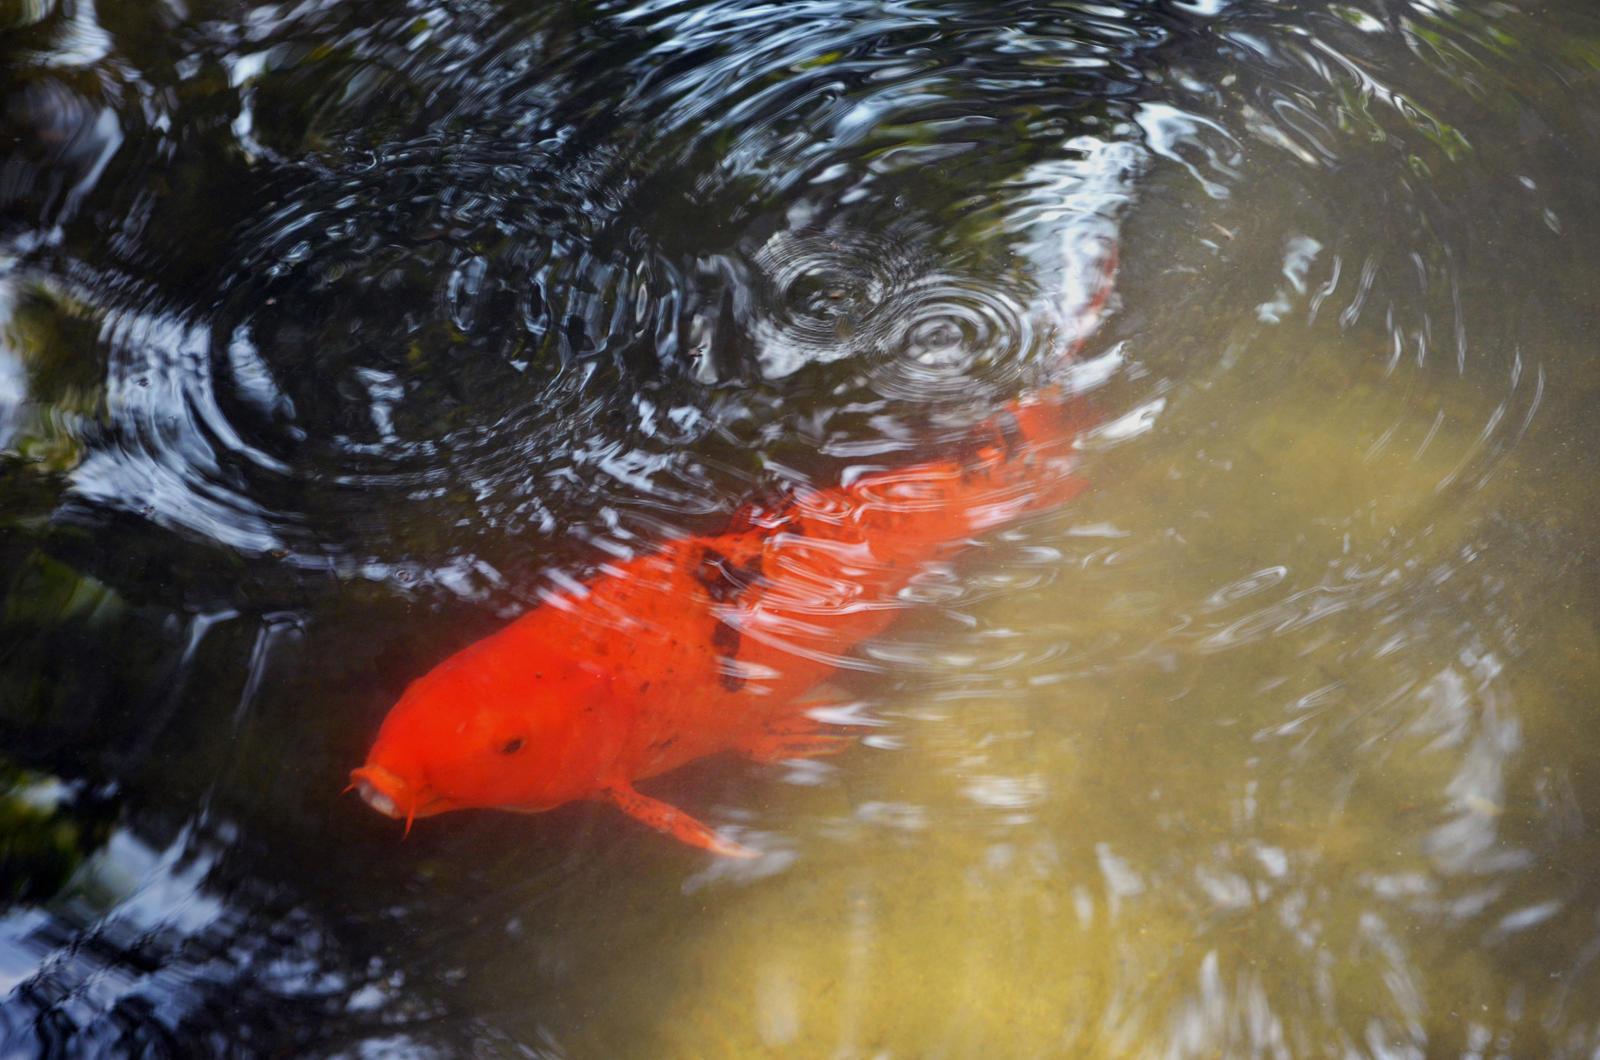 Koi Fish Pond Stock Photo Dsc 0704 By Annamae22 On Deviantart